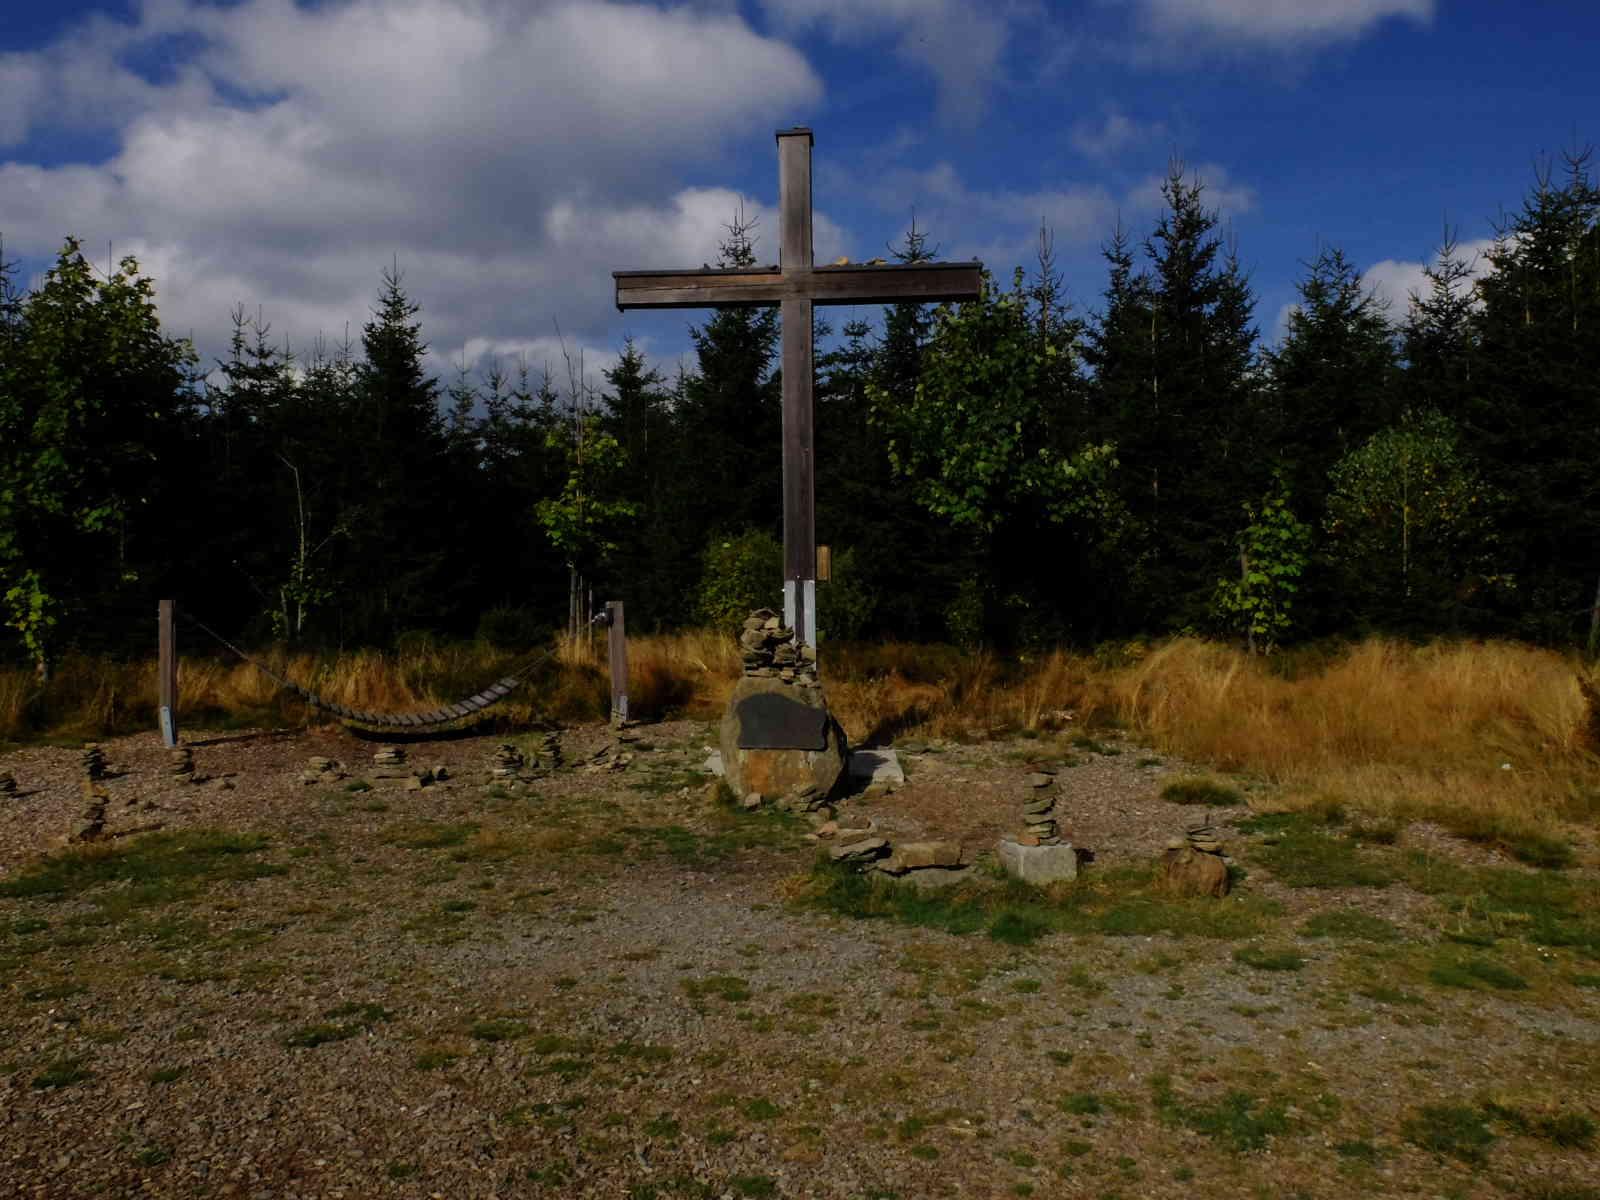 Rothaarsteig Etappe 2 - Gipfelkreuz